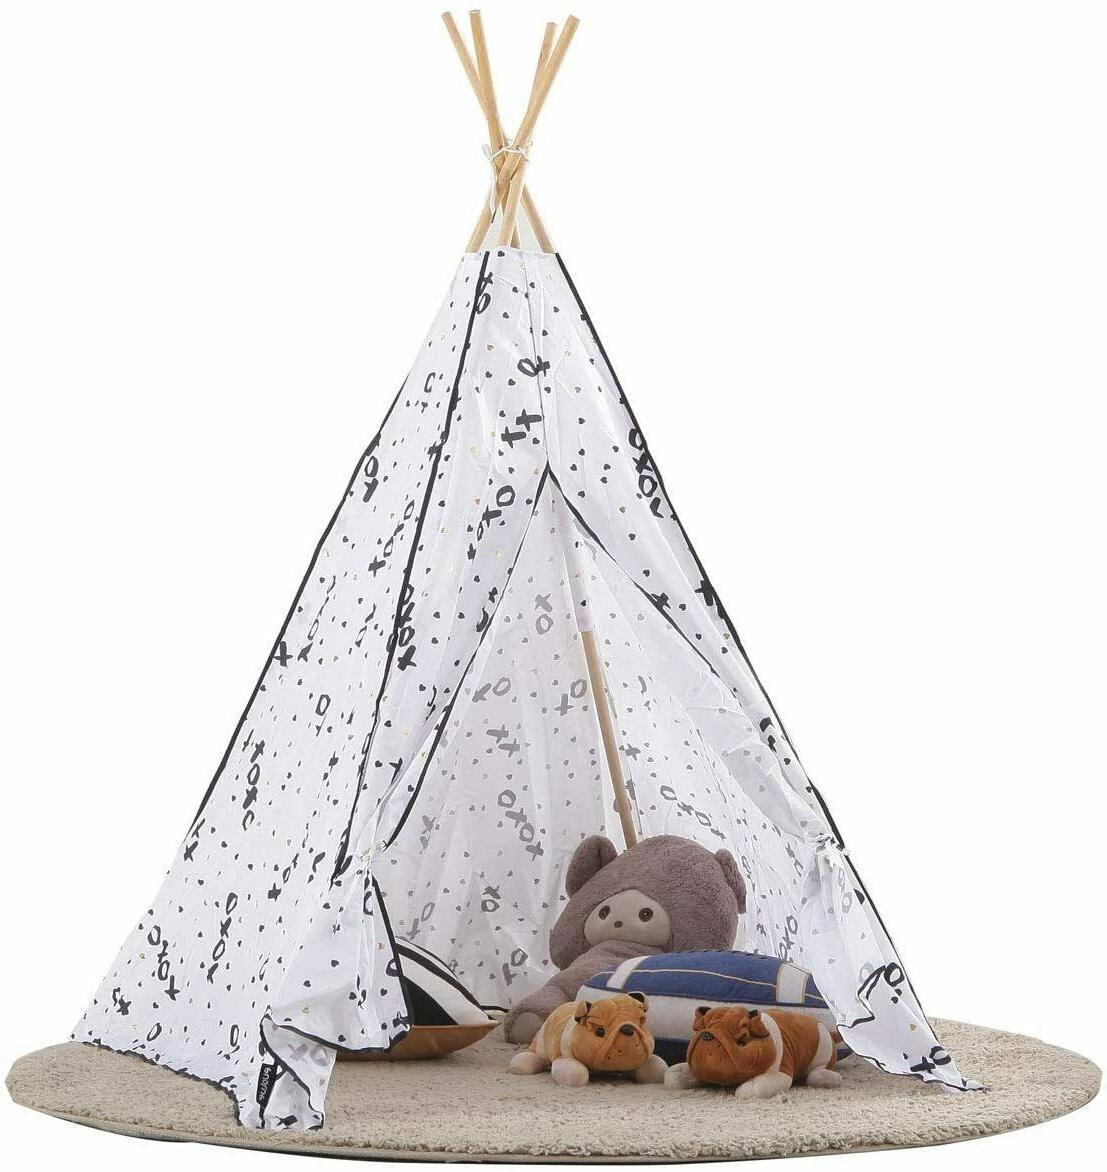 MallBest Kids Indian Tent Playhouse Canvas